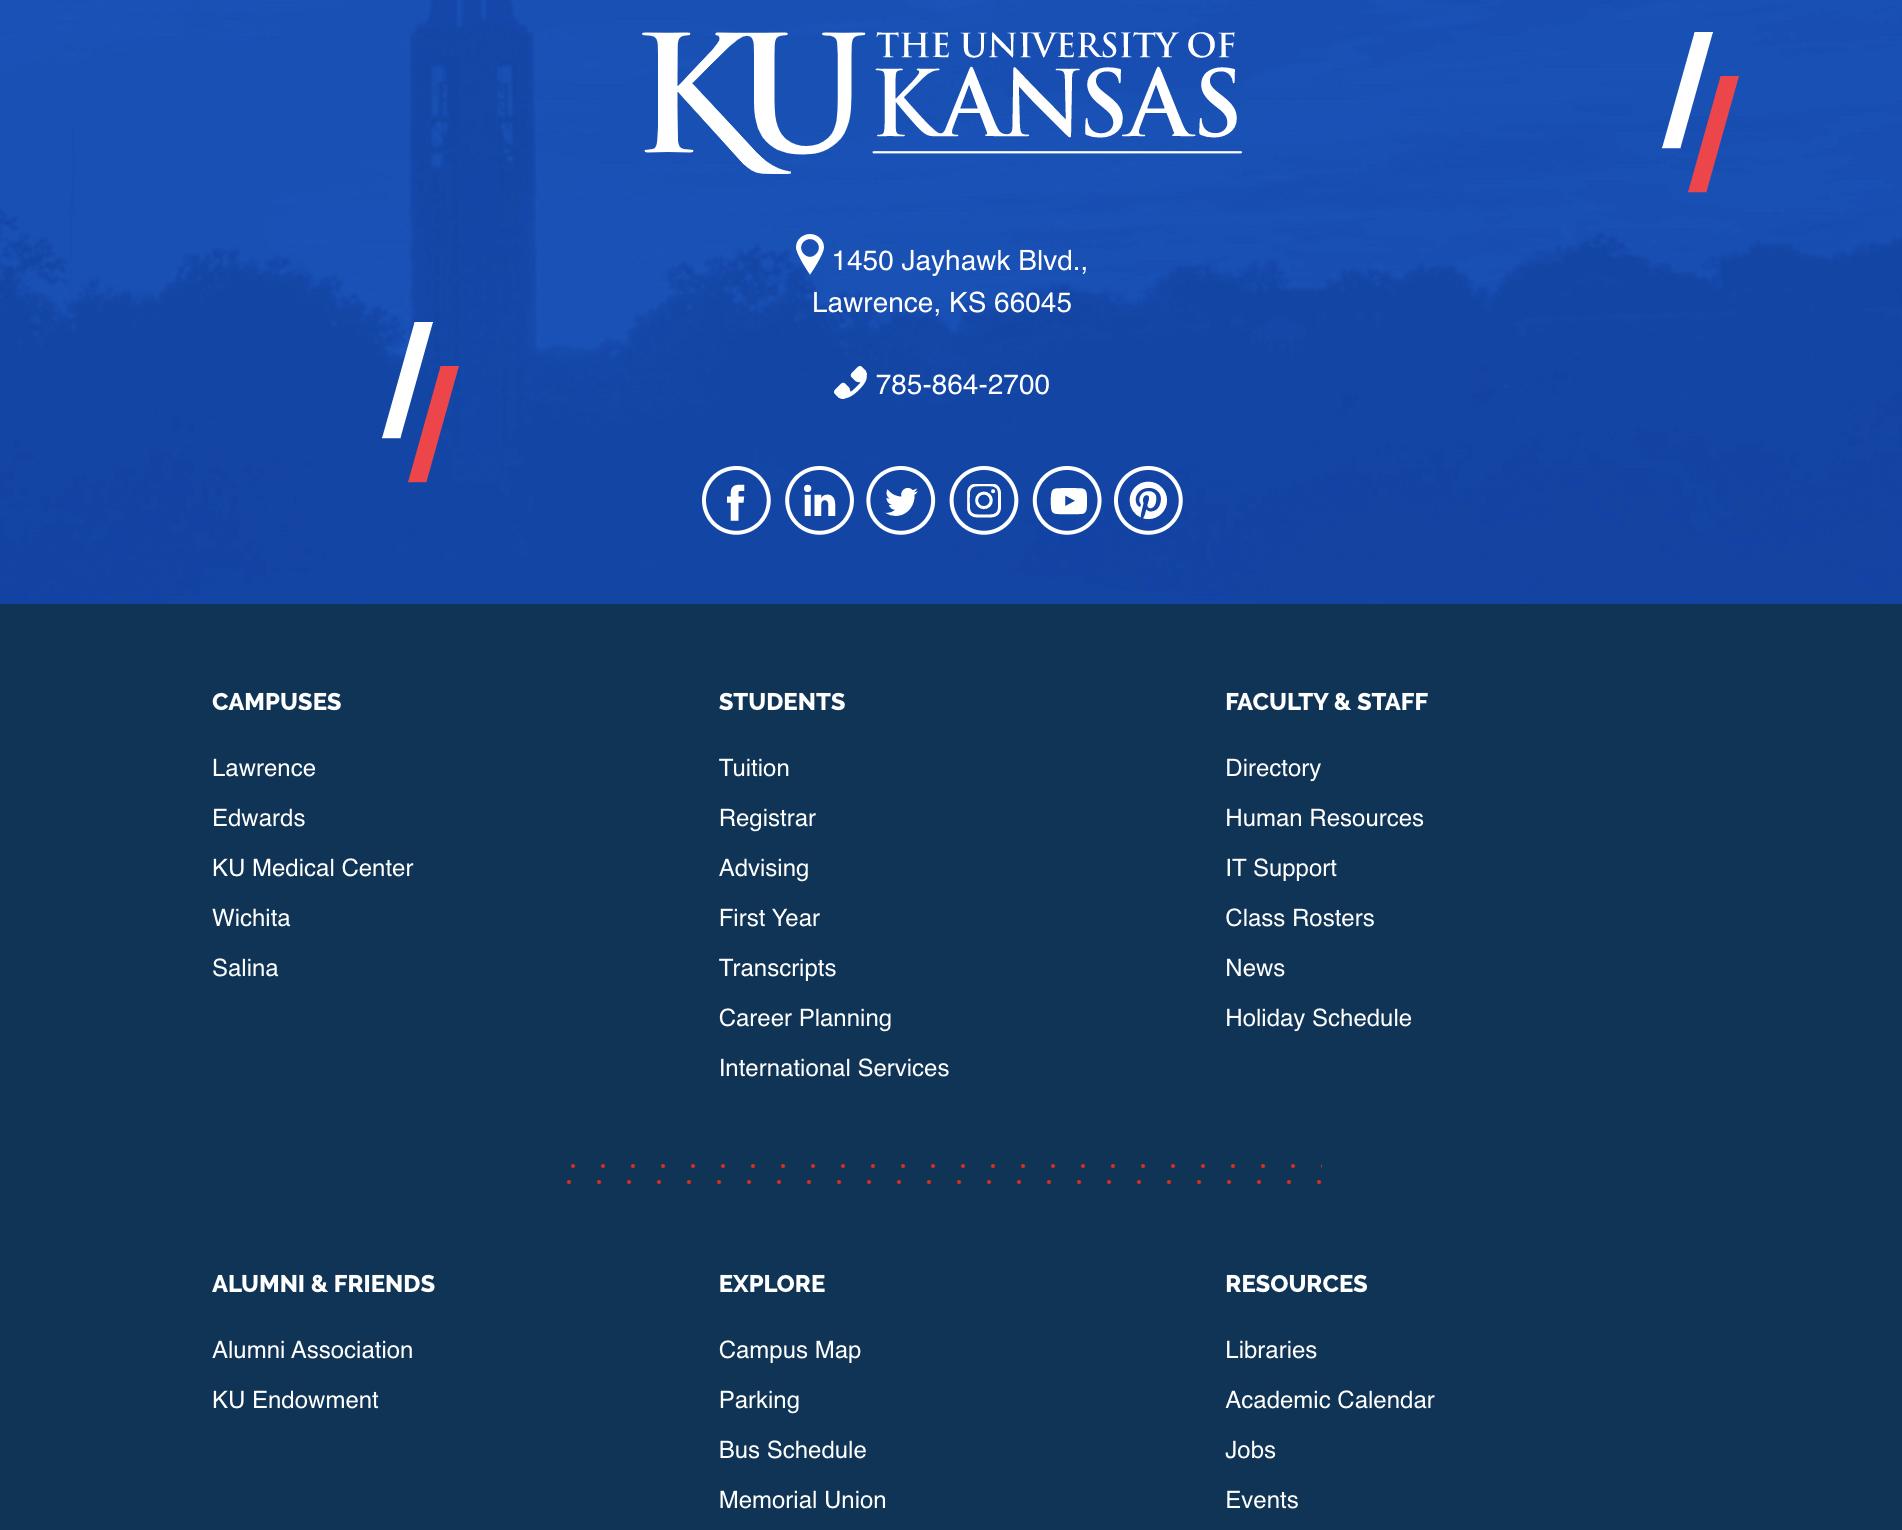 Kansas University website footer